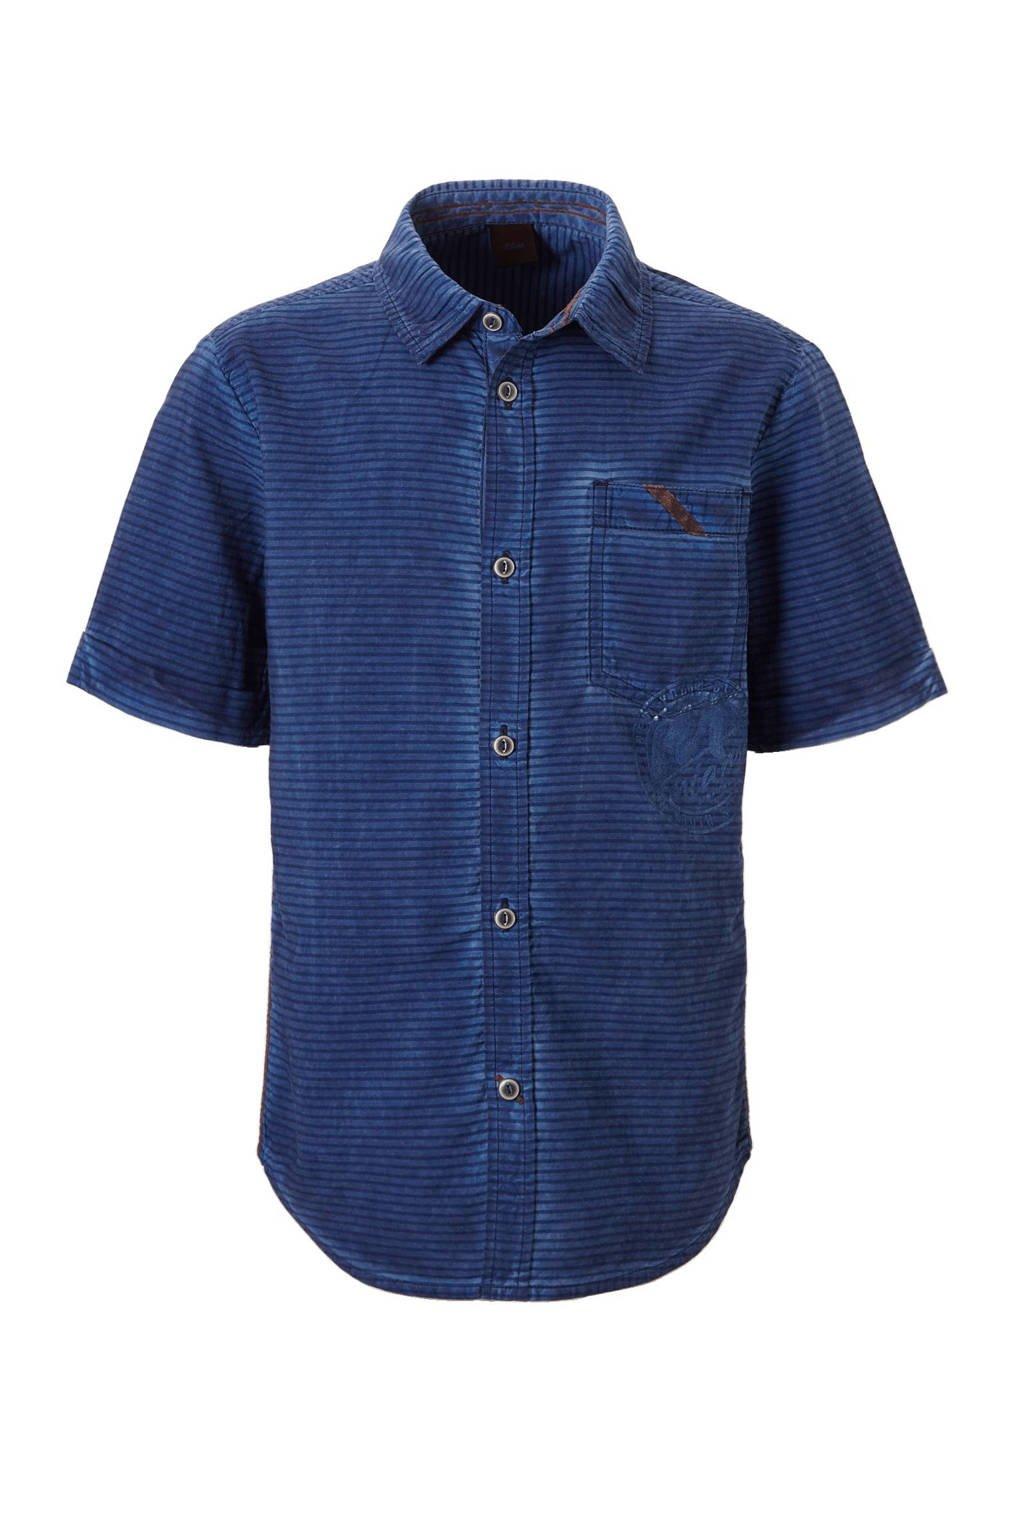 s.Oliver gestreept overhemd donkerblauw, Donkerblauw